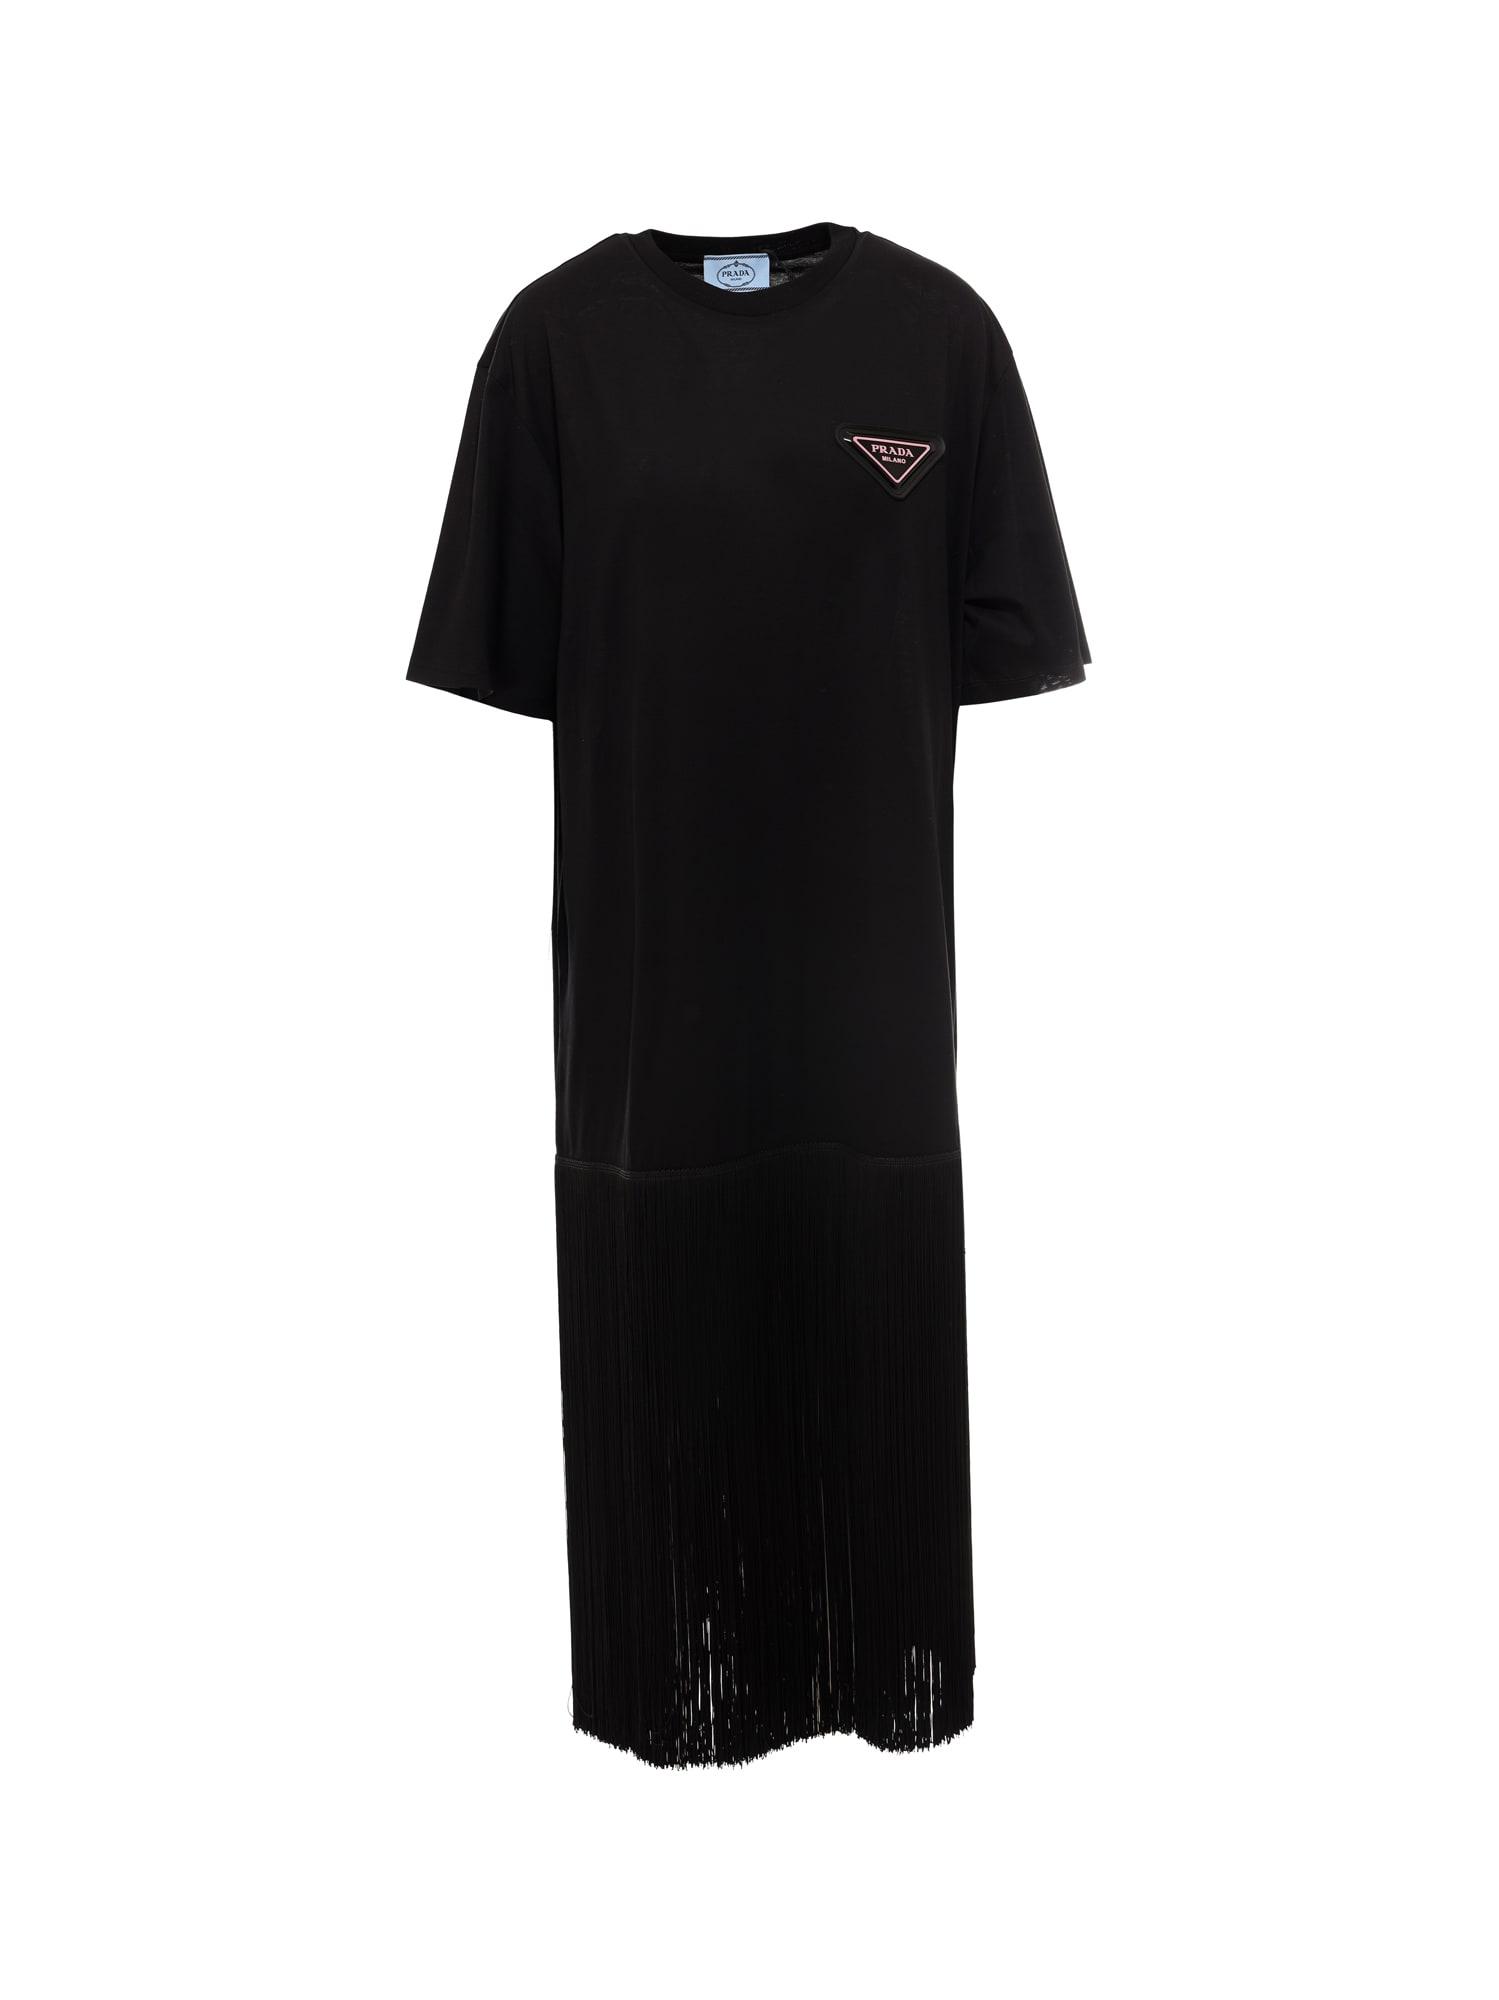 Prada Cottons DRESS